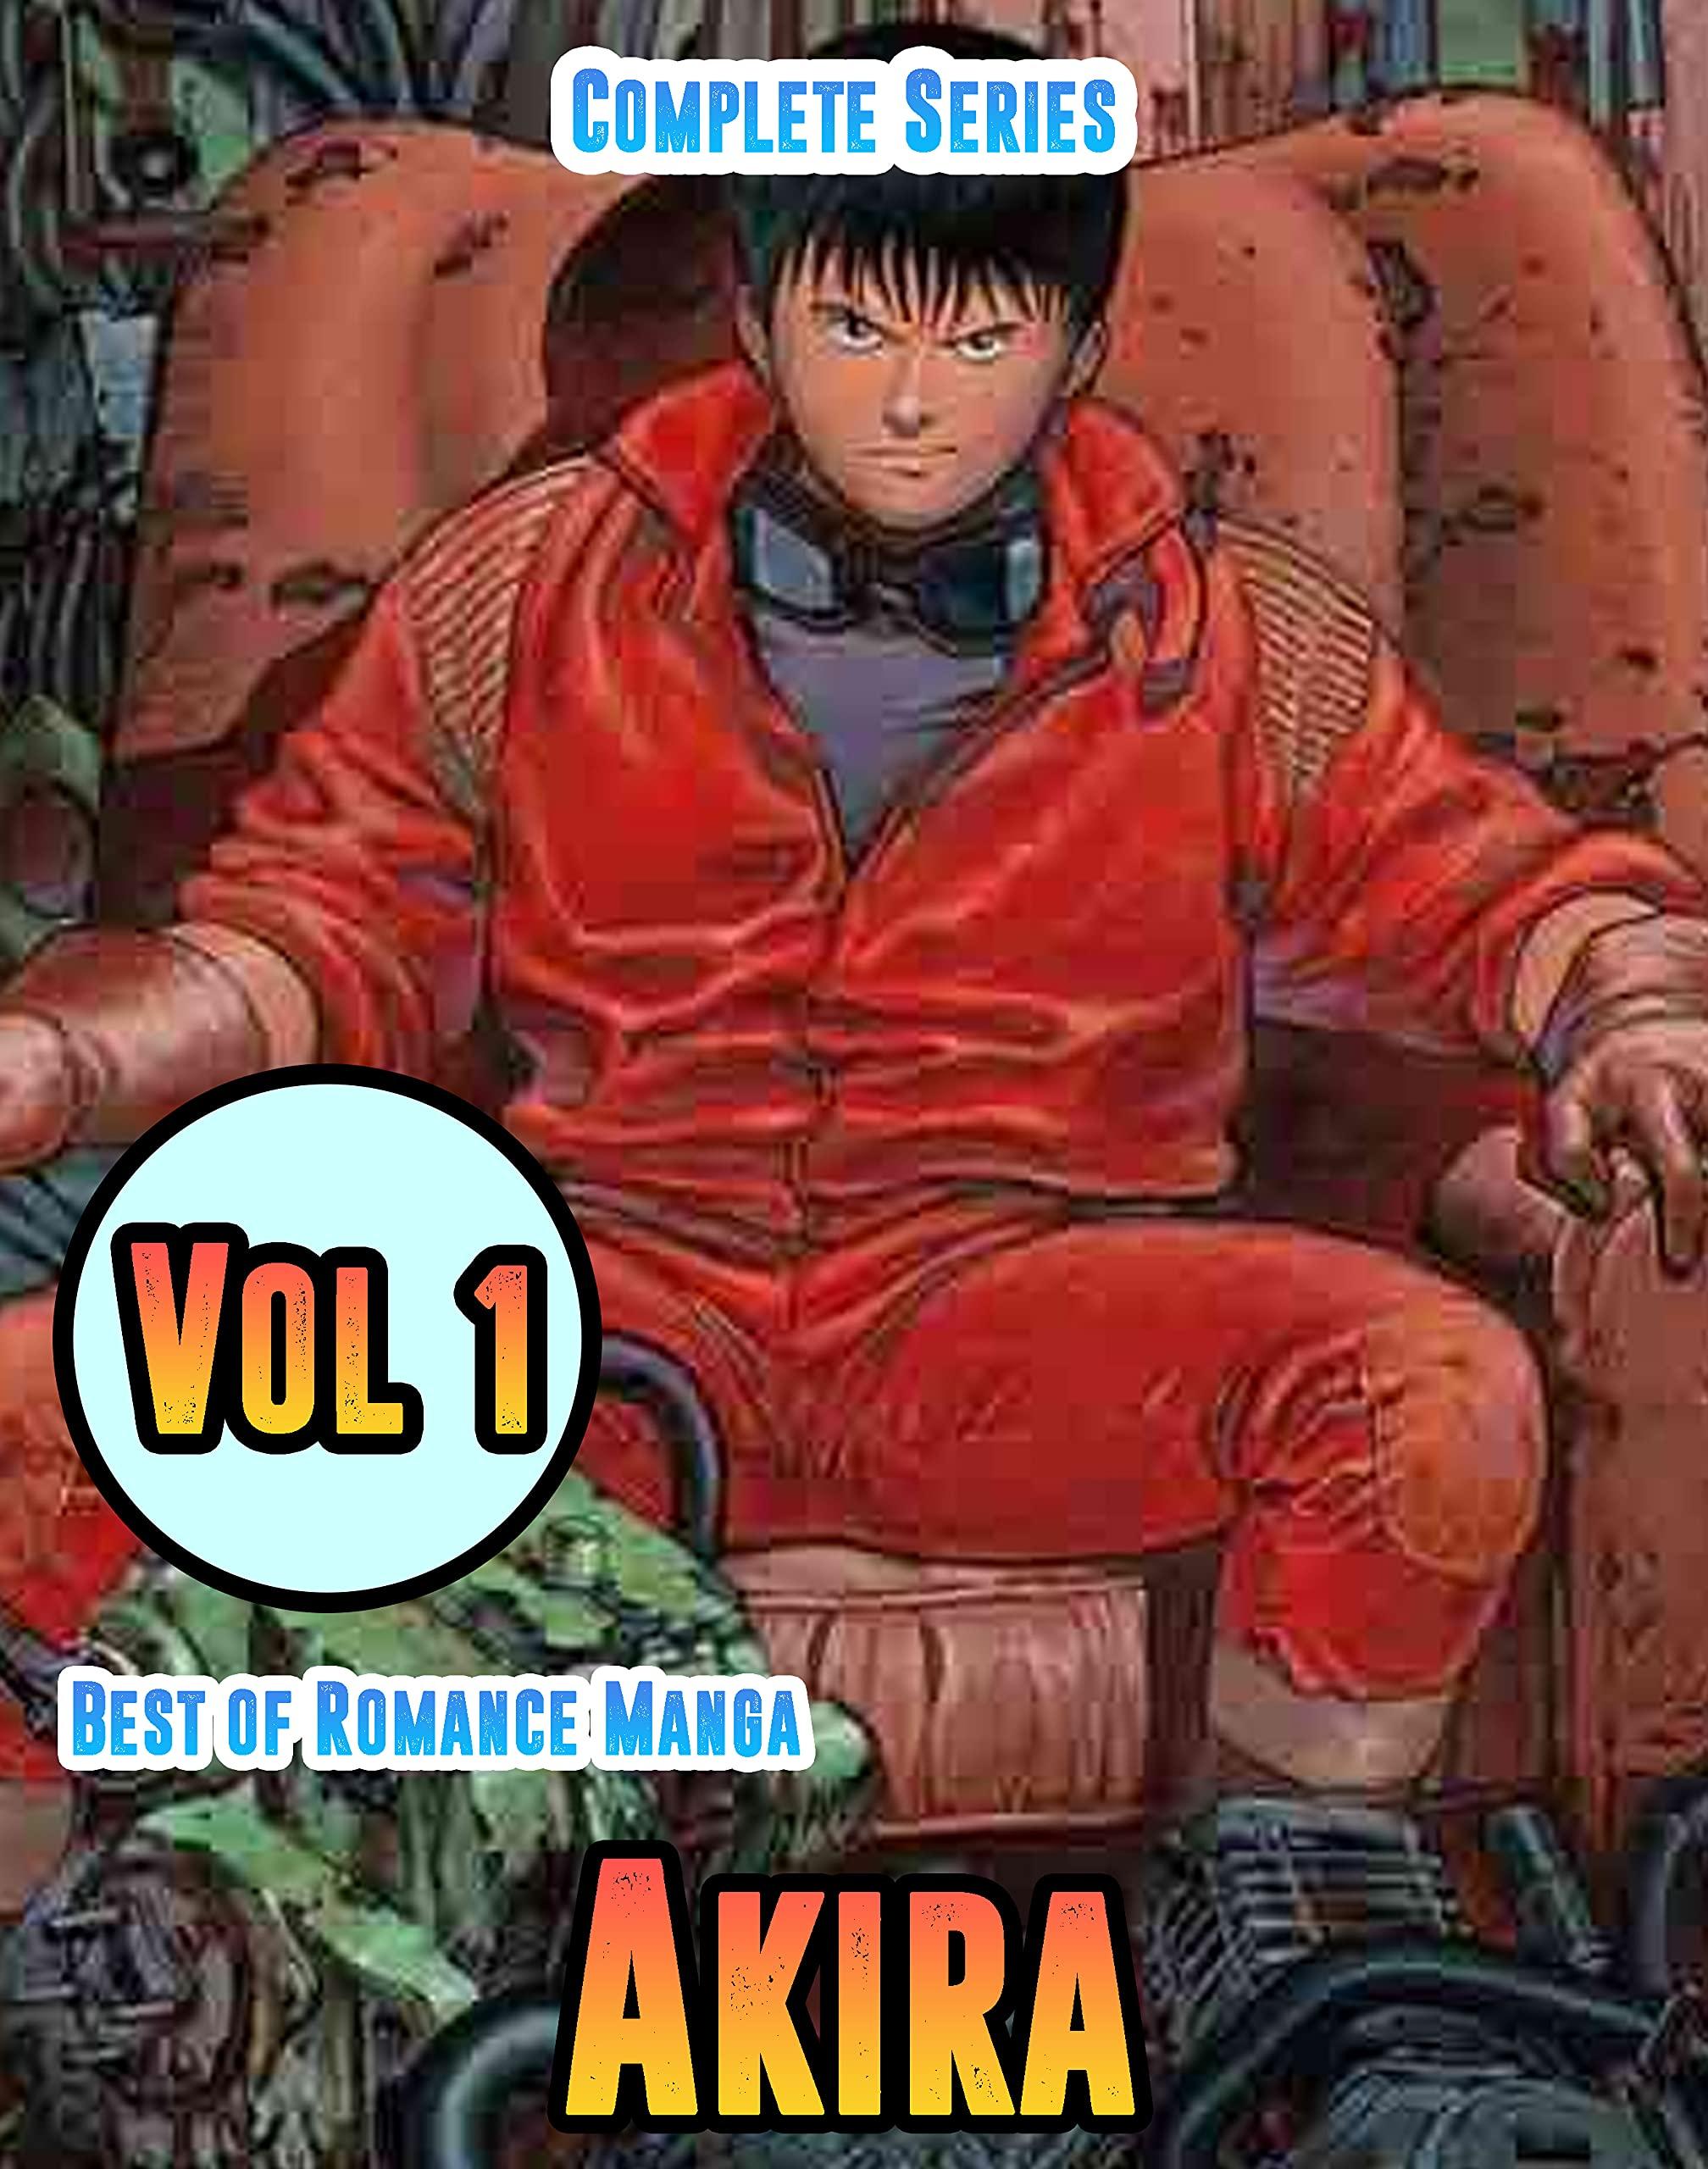 Best of Romance Manga Complete Series: Limited Edition Akira